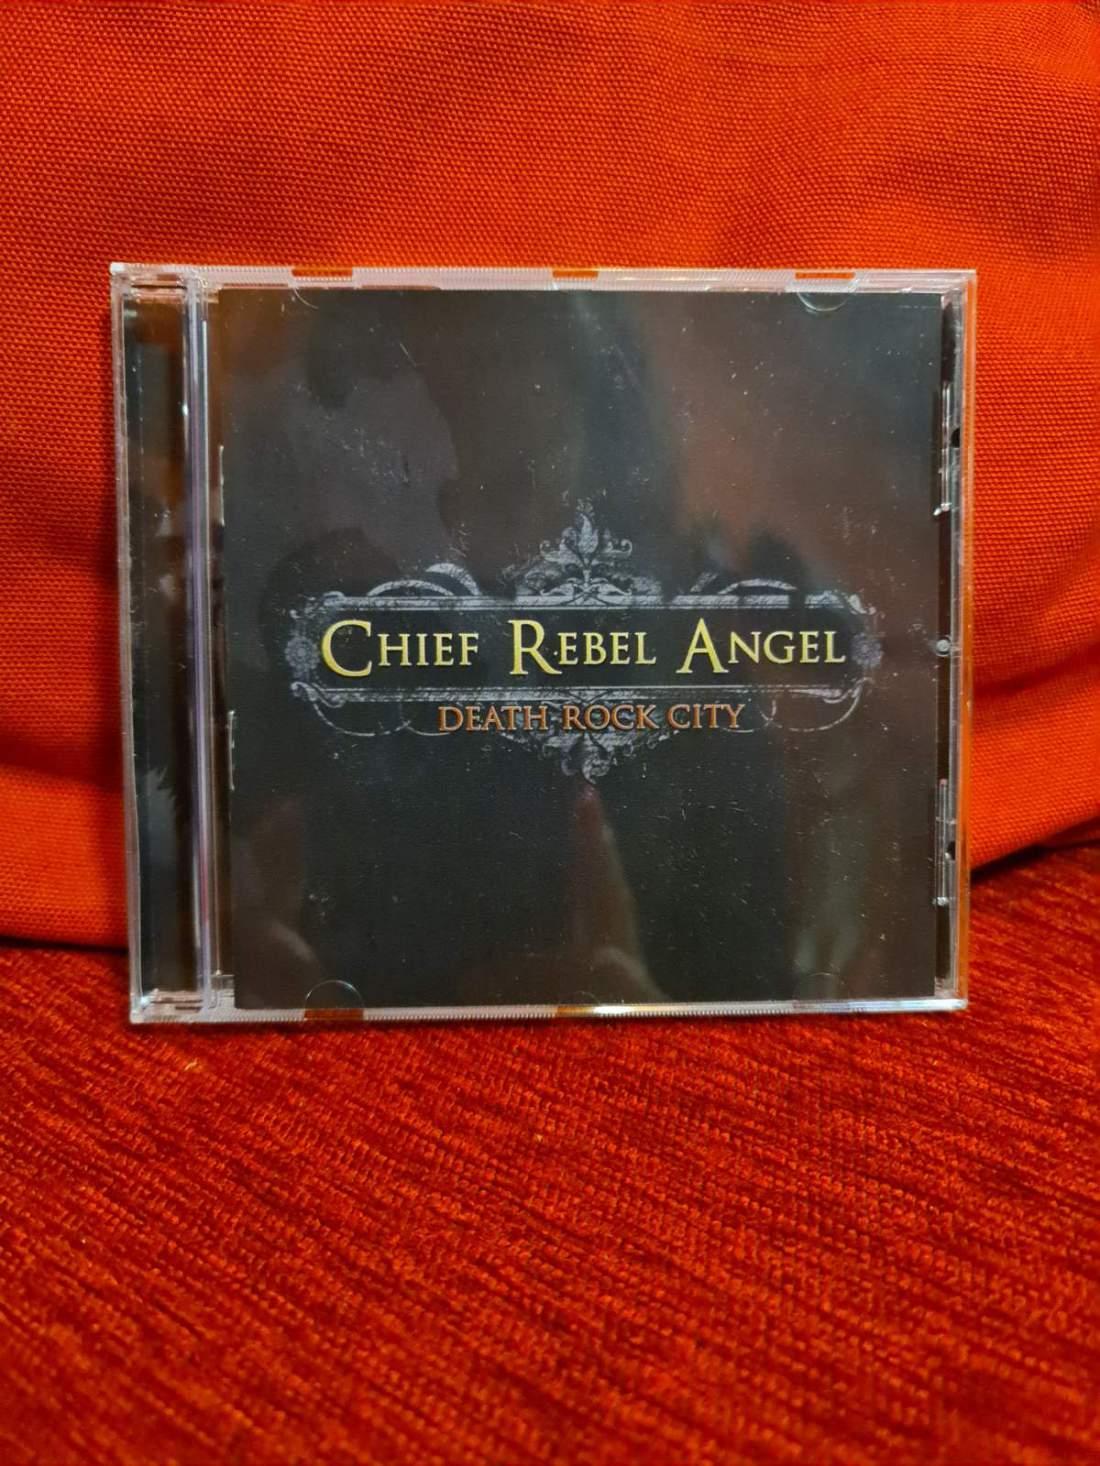 CHIEF REBEL ANGEL - DEATH ROCK CITY CD